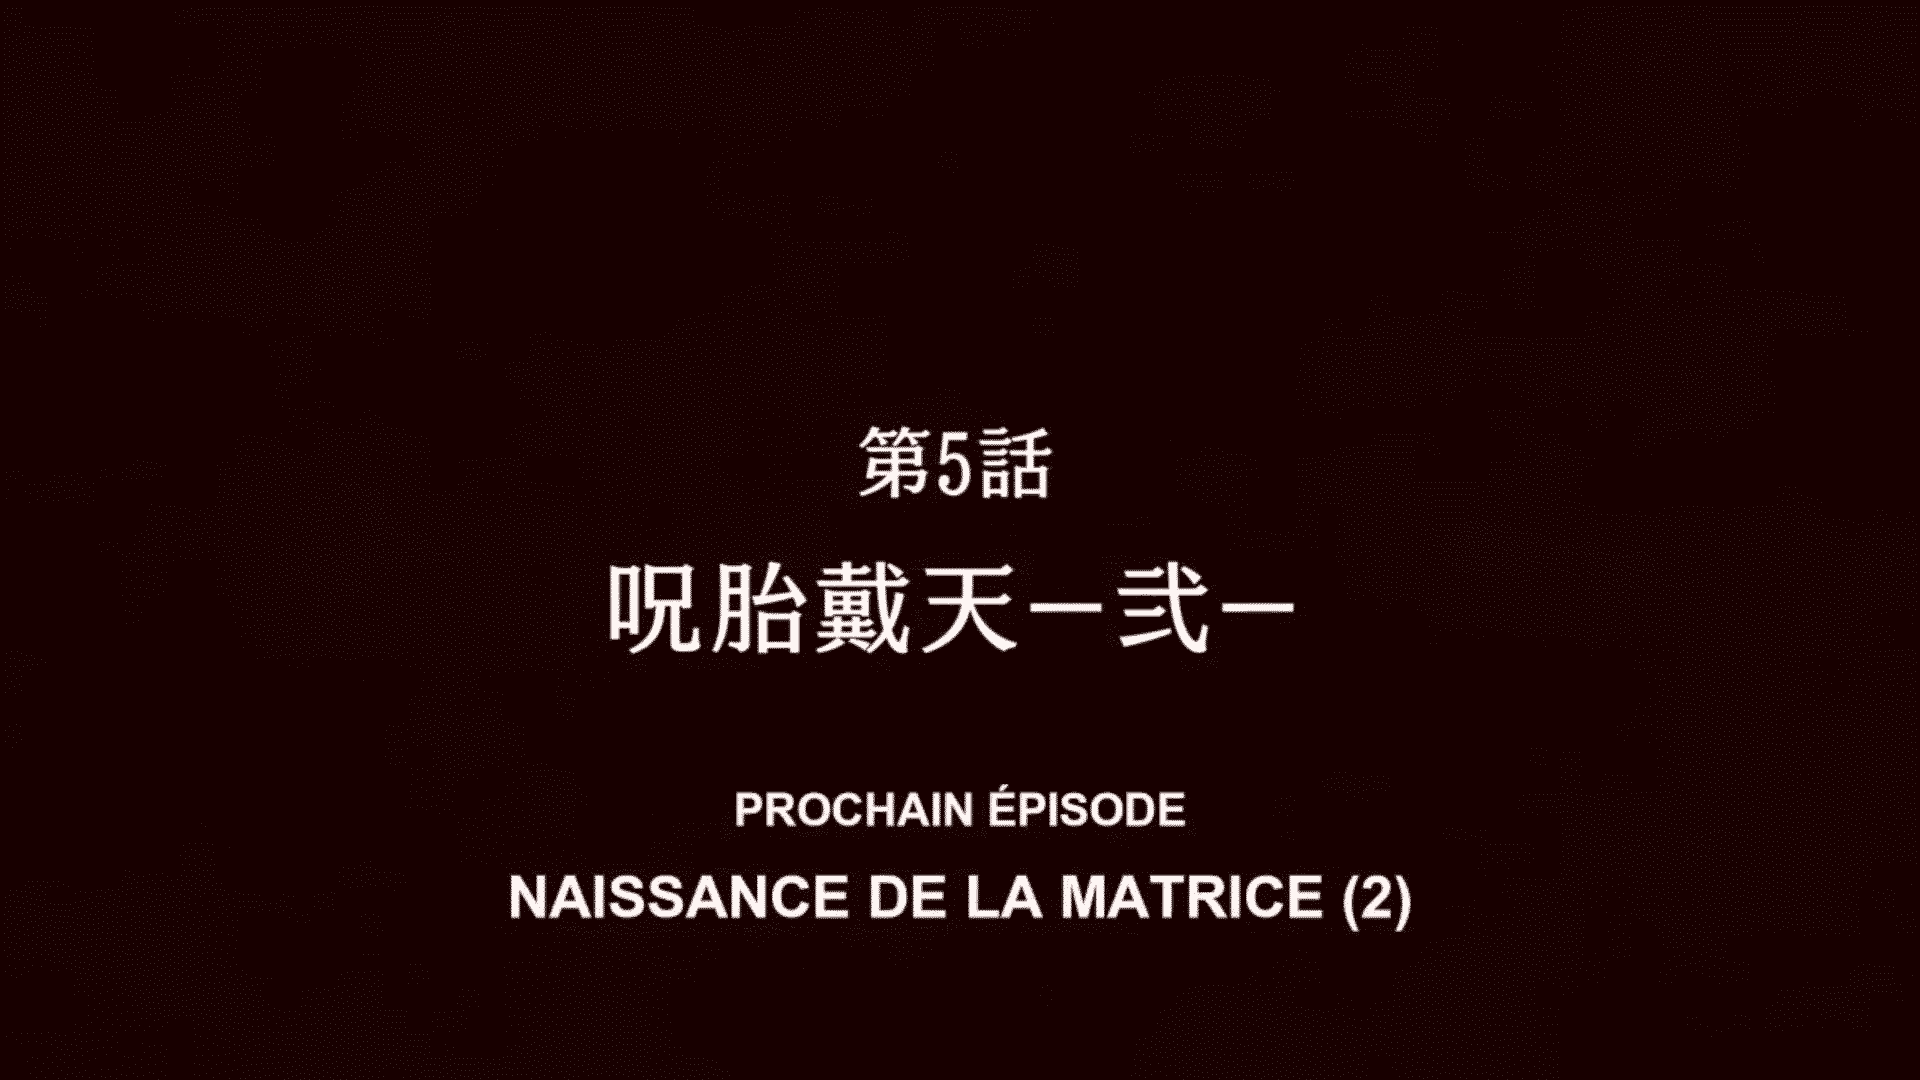 Jujutsu Kaisen 05 Vostfr – Naissance de la matrice Partie 2